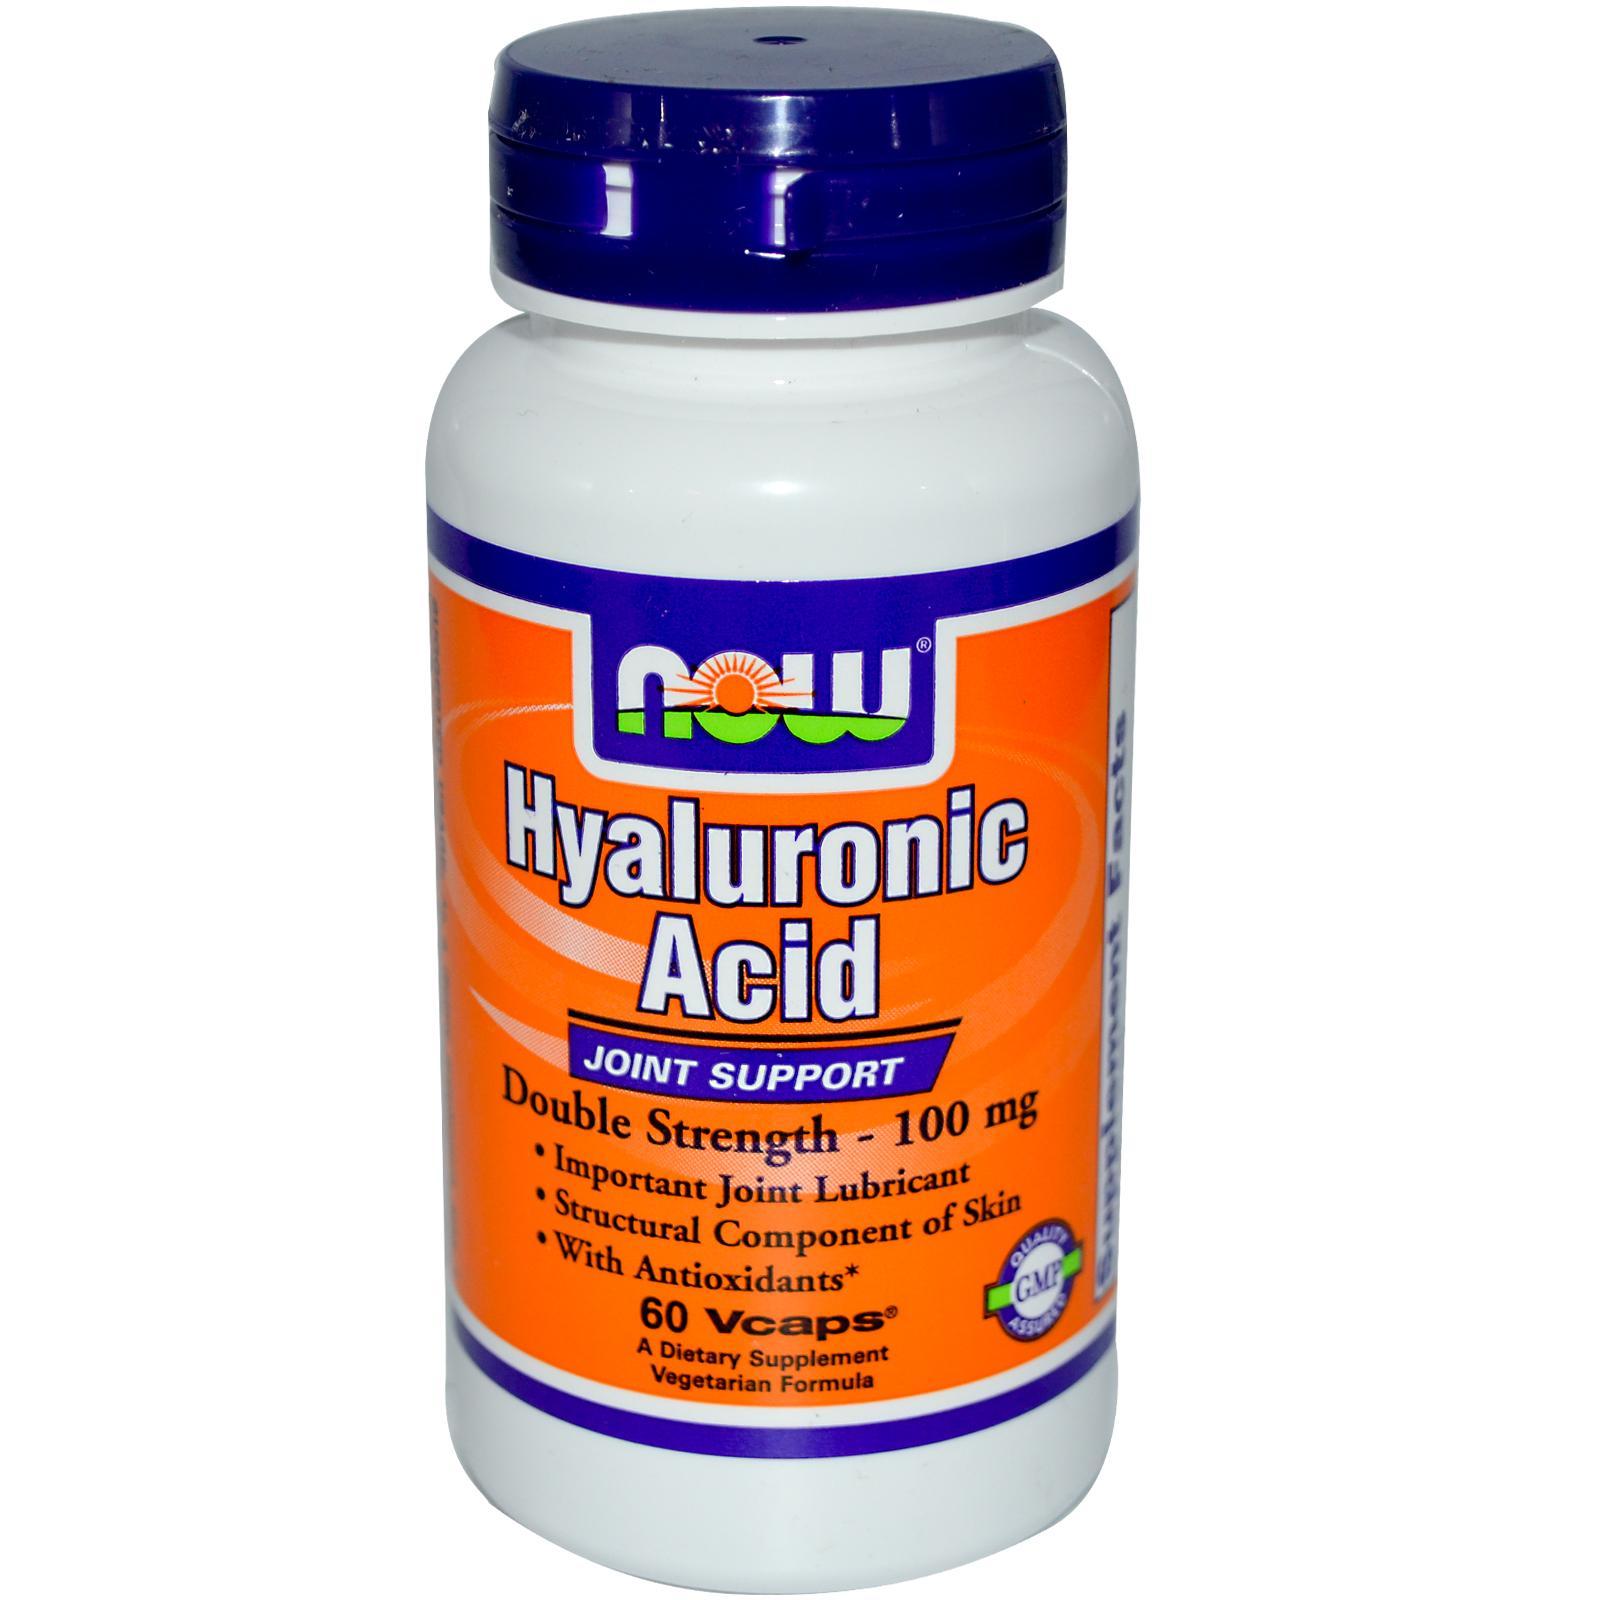 Hyaluronic Acid, 100mg (Double Strength) - 60 vcaps versandkostenfrei/portofrei bestellen/kaufen